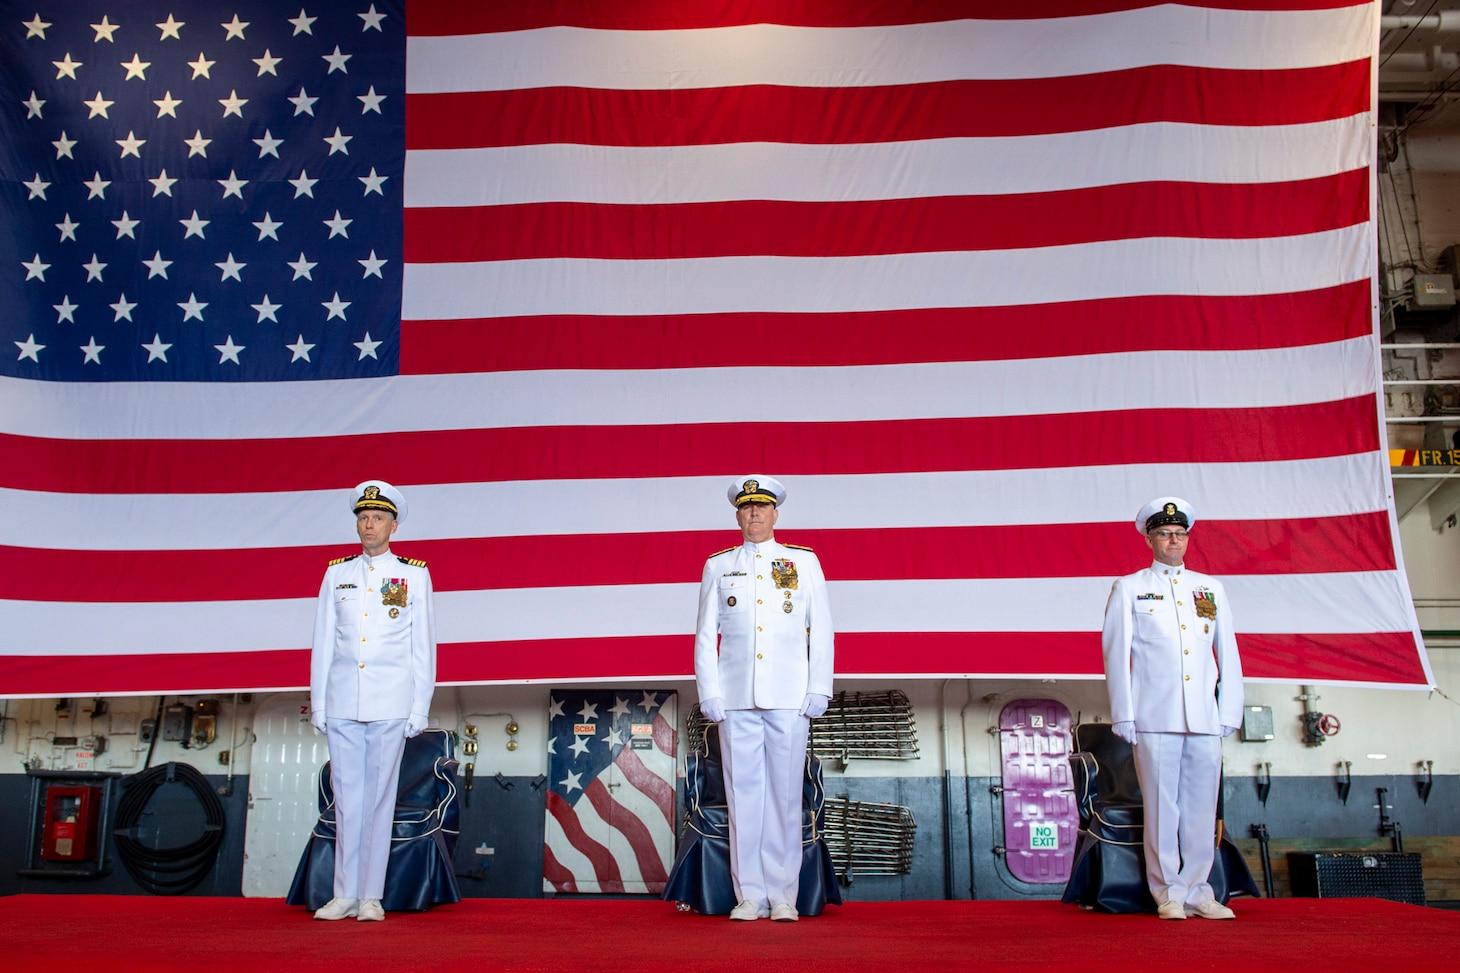 Adm. Christopher W. Grady, commander, U.S. Fleet Forces Command, center, presides over the retirement ceremony of Fleet Master Chief Rick O'Rawe on board USS Harry S. Truman (CVN 75) in Norfolk, Va., September 2, 2021.